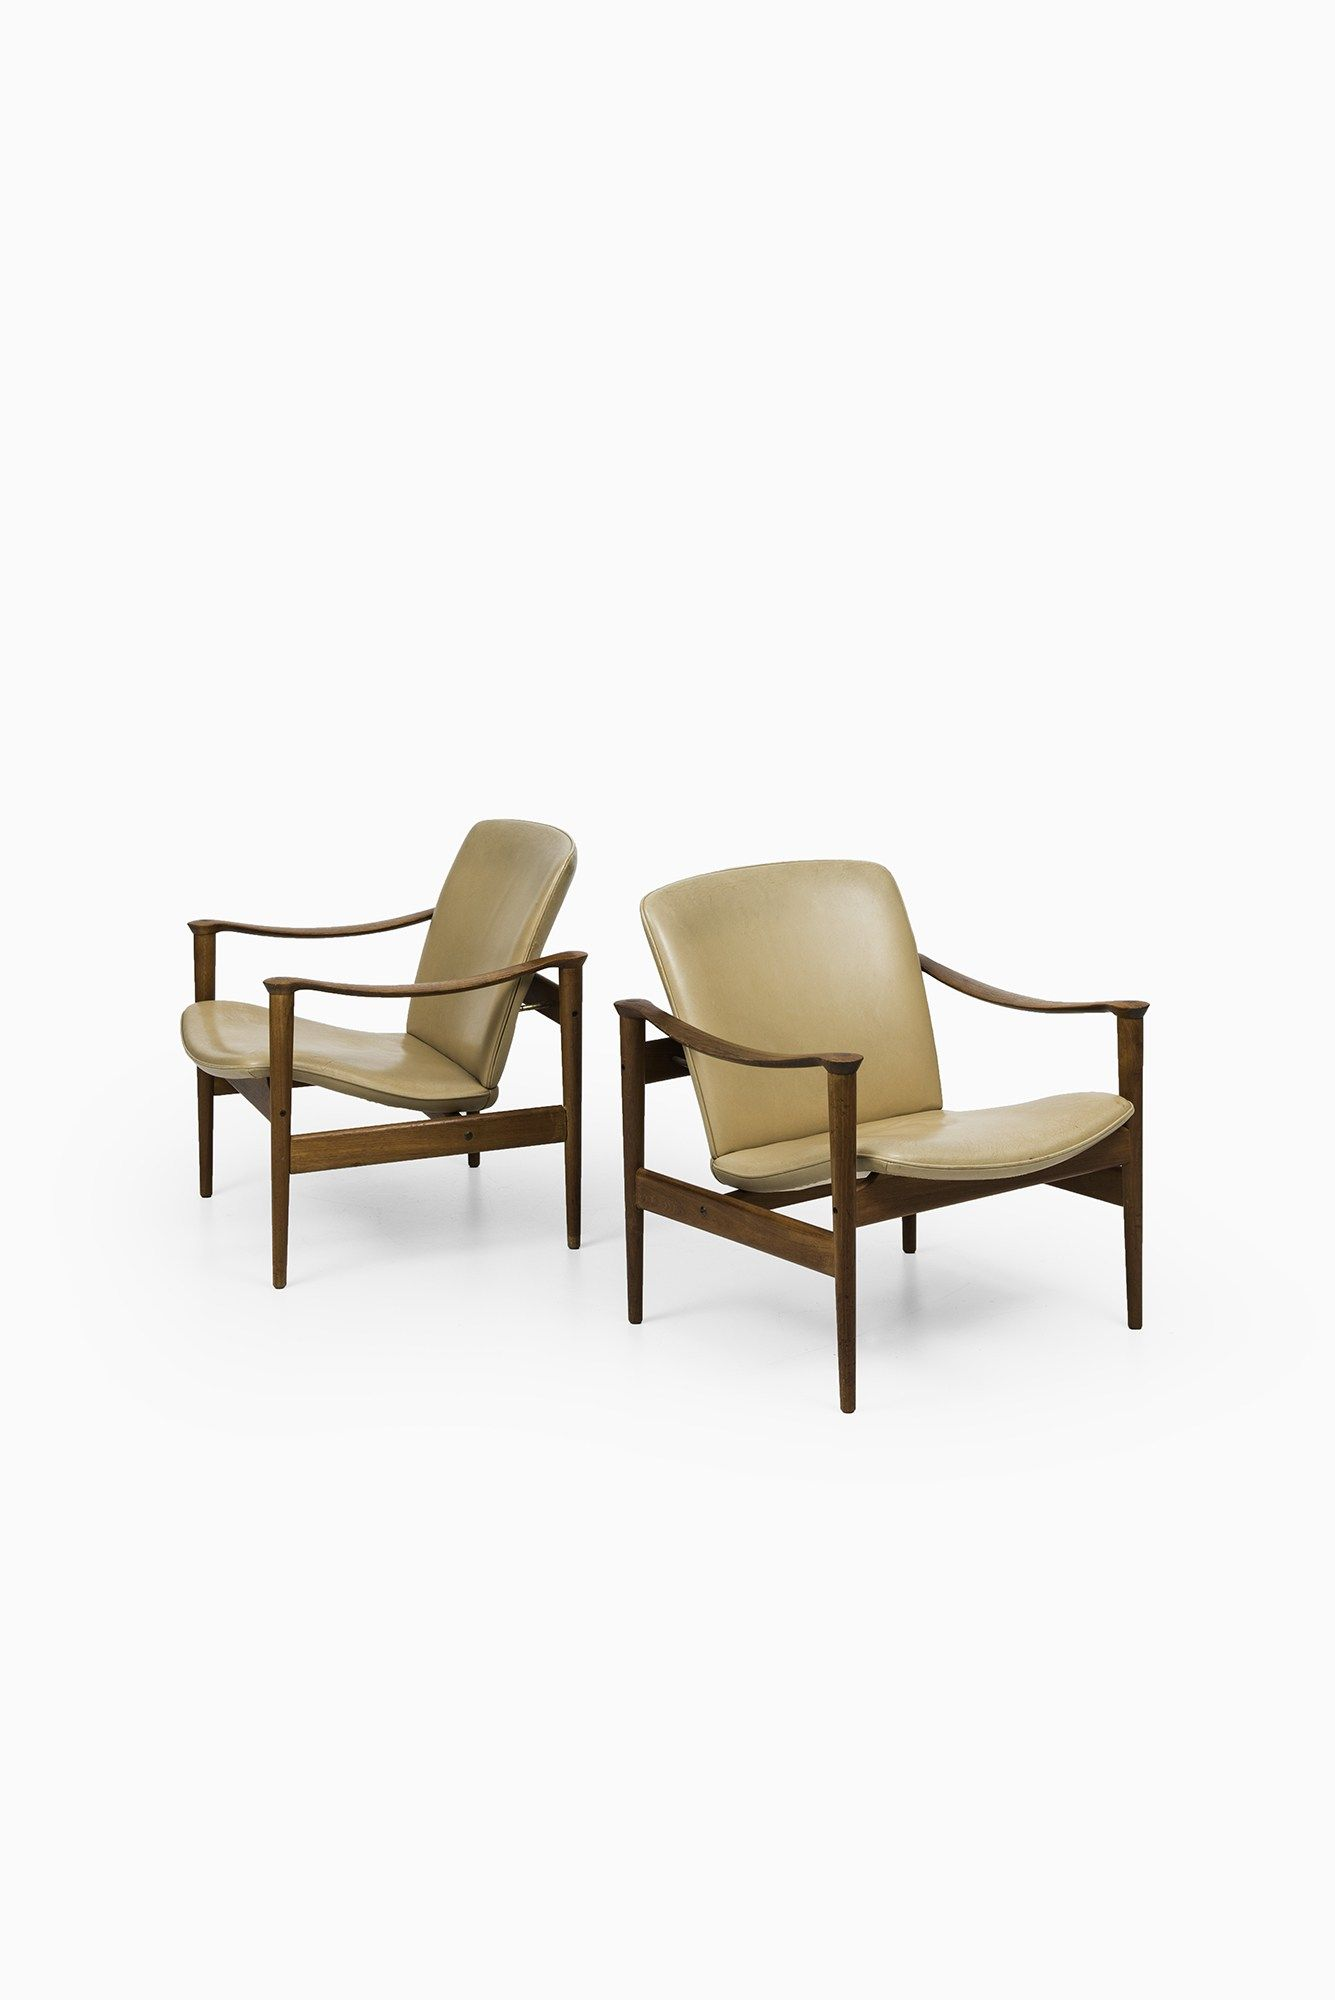 Fredrik Kayser model 711 easy chairs at Studio Schalling